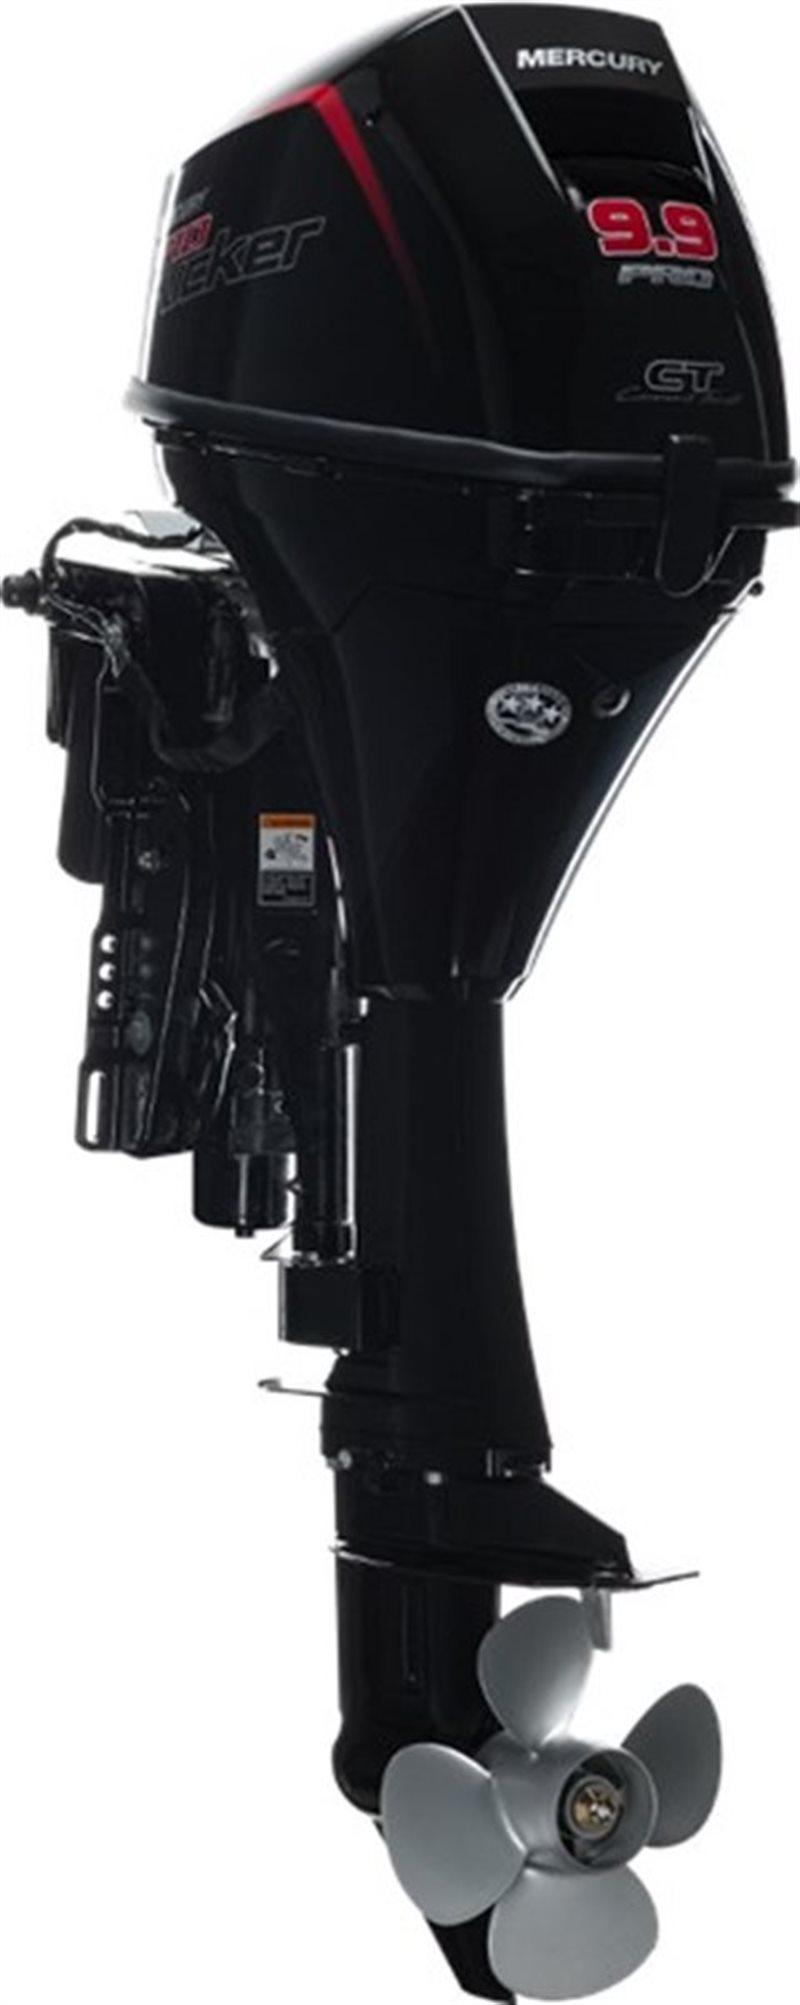 99 hp EFI ProKicker at DT Powersports & Marine